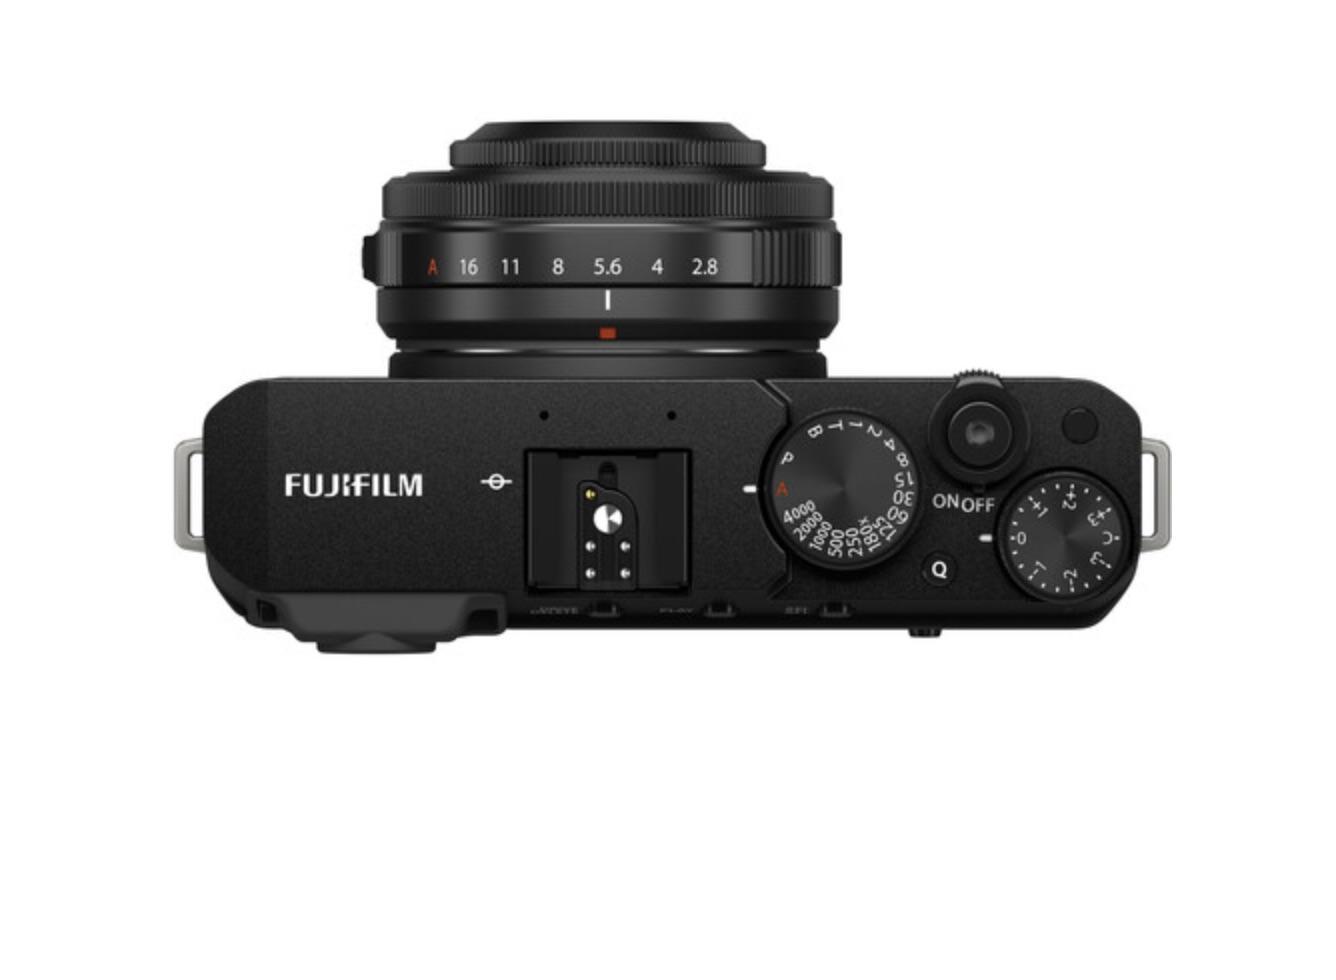 https://thedigitalstory.com/2021/02/02/Fujifilm-New.jpg